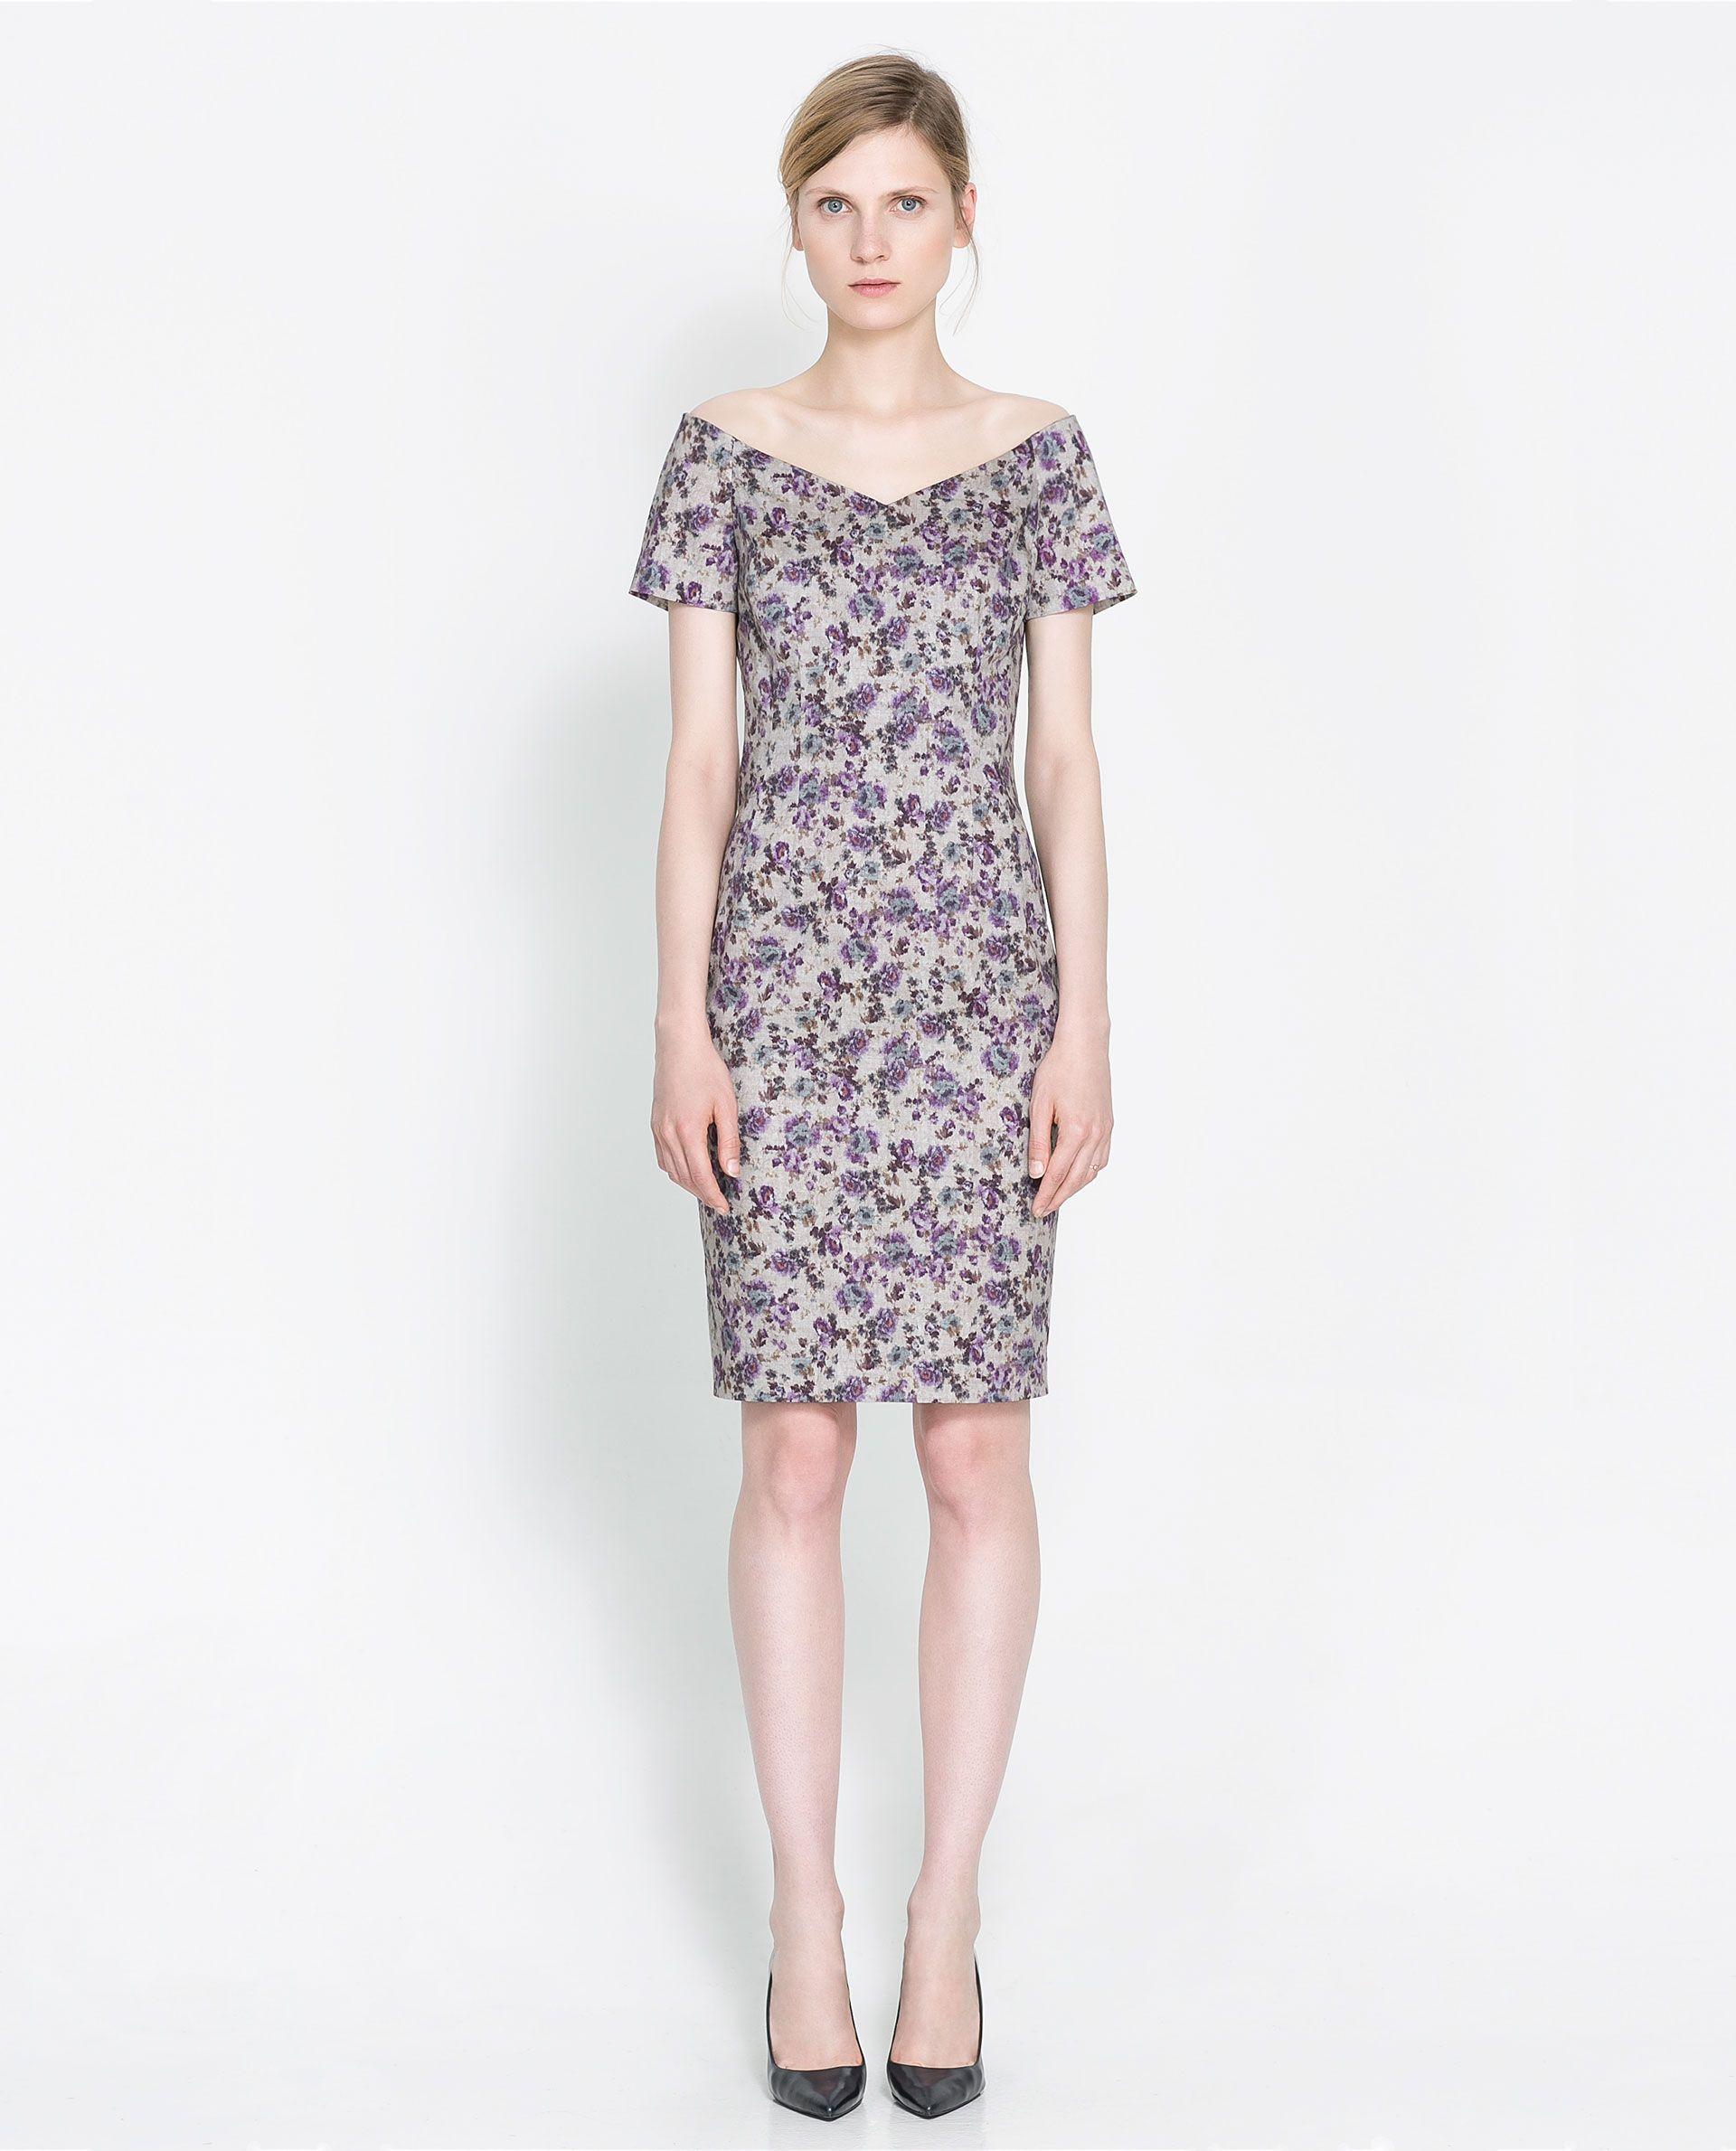 ZARA - WOMAN - BOAT NECK PRINTED DRESS 60usd